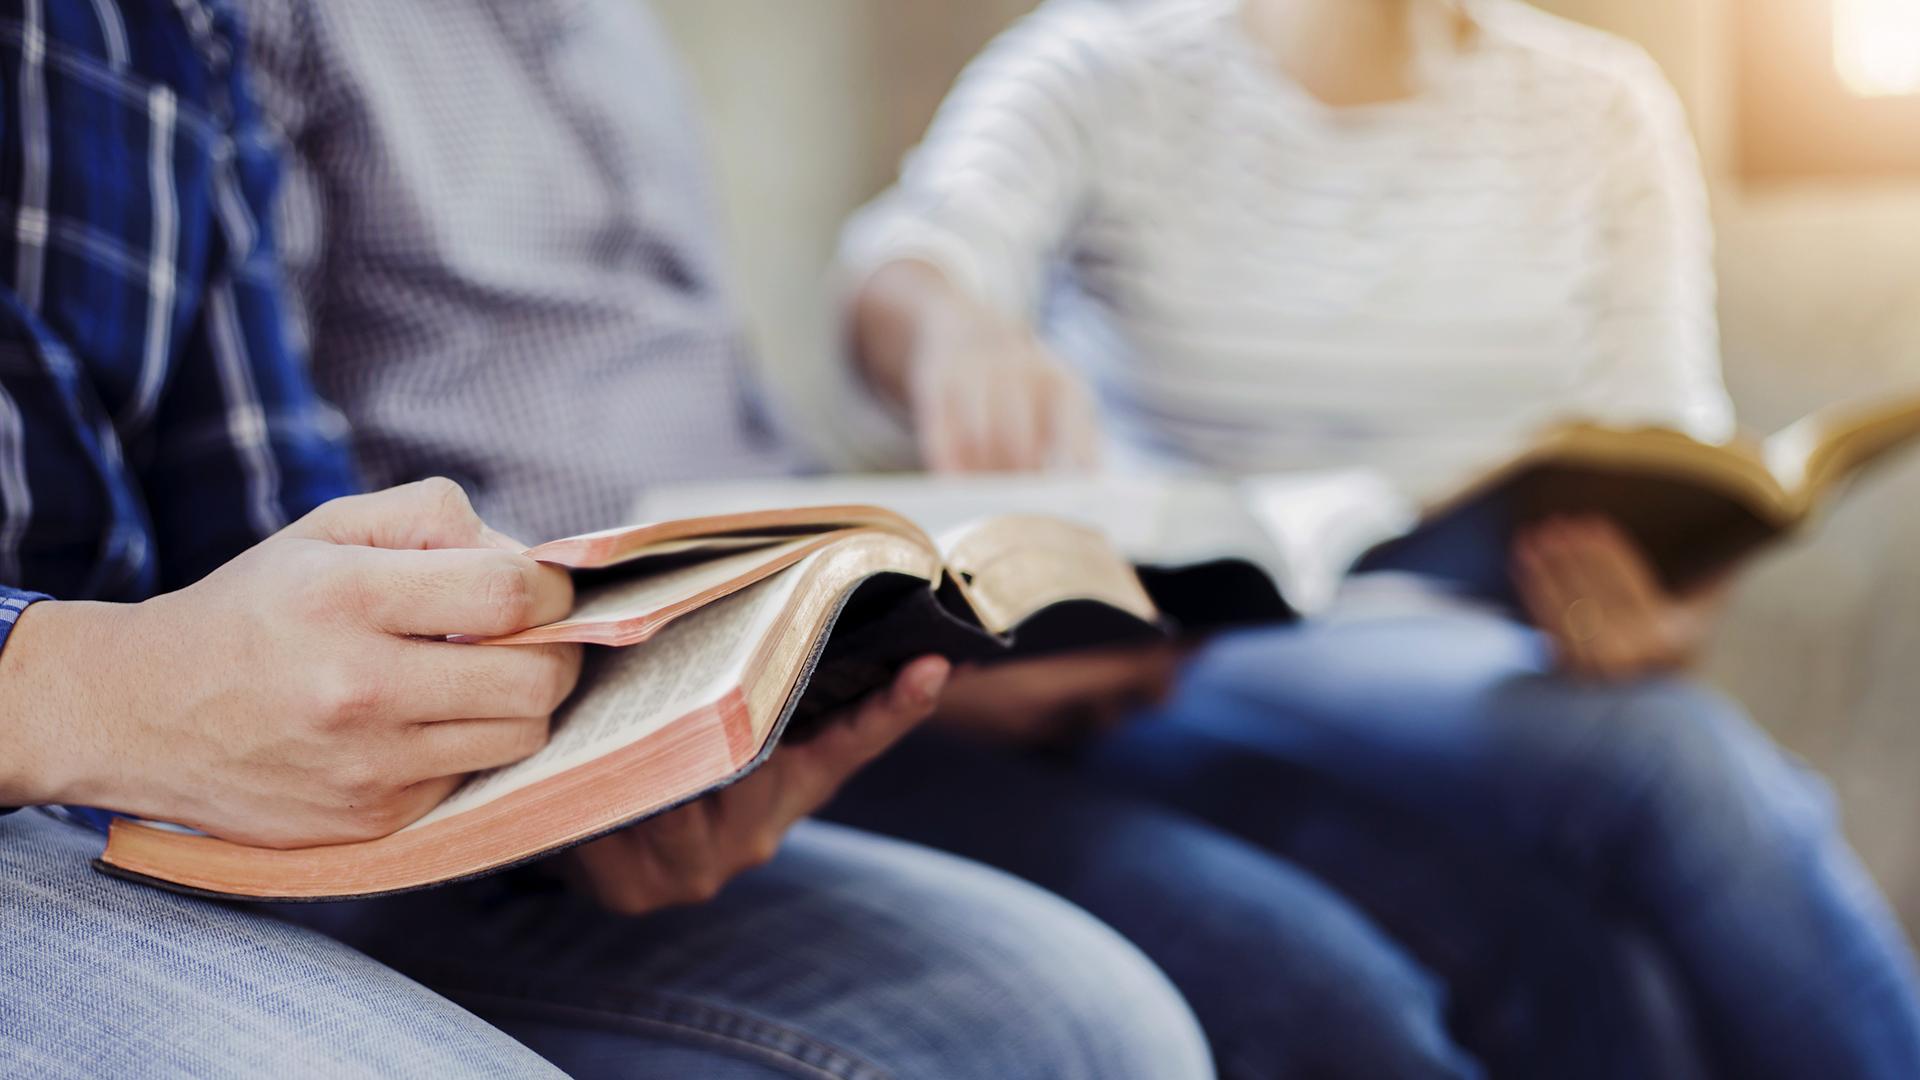 Animer un groupe biblique